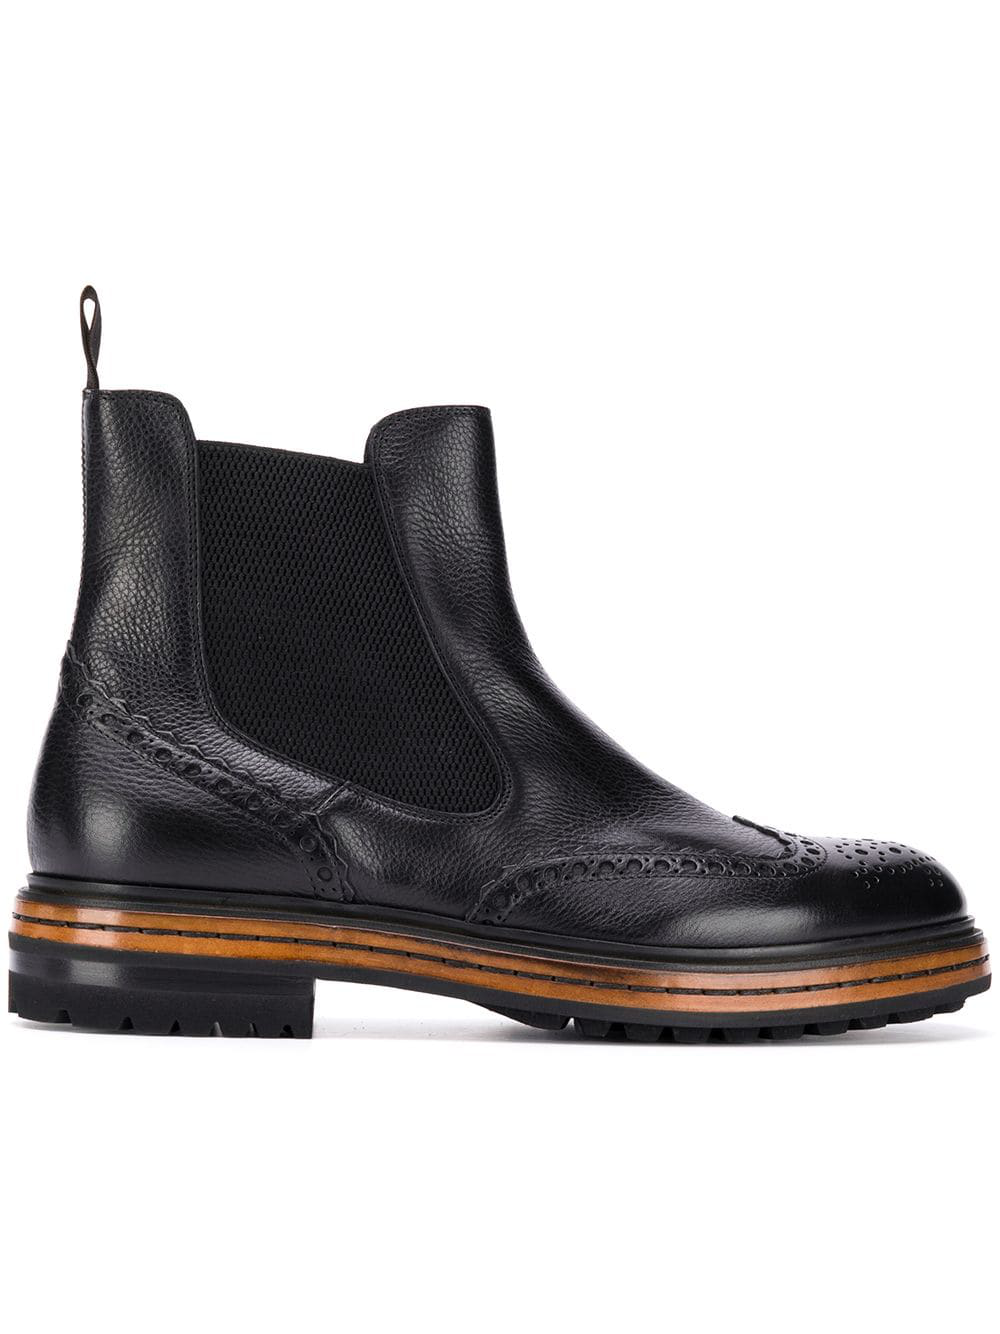 4e27bdd7313588 Santoni Derby Ankle Boots - Black